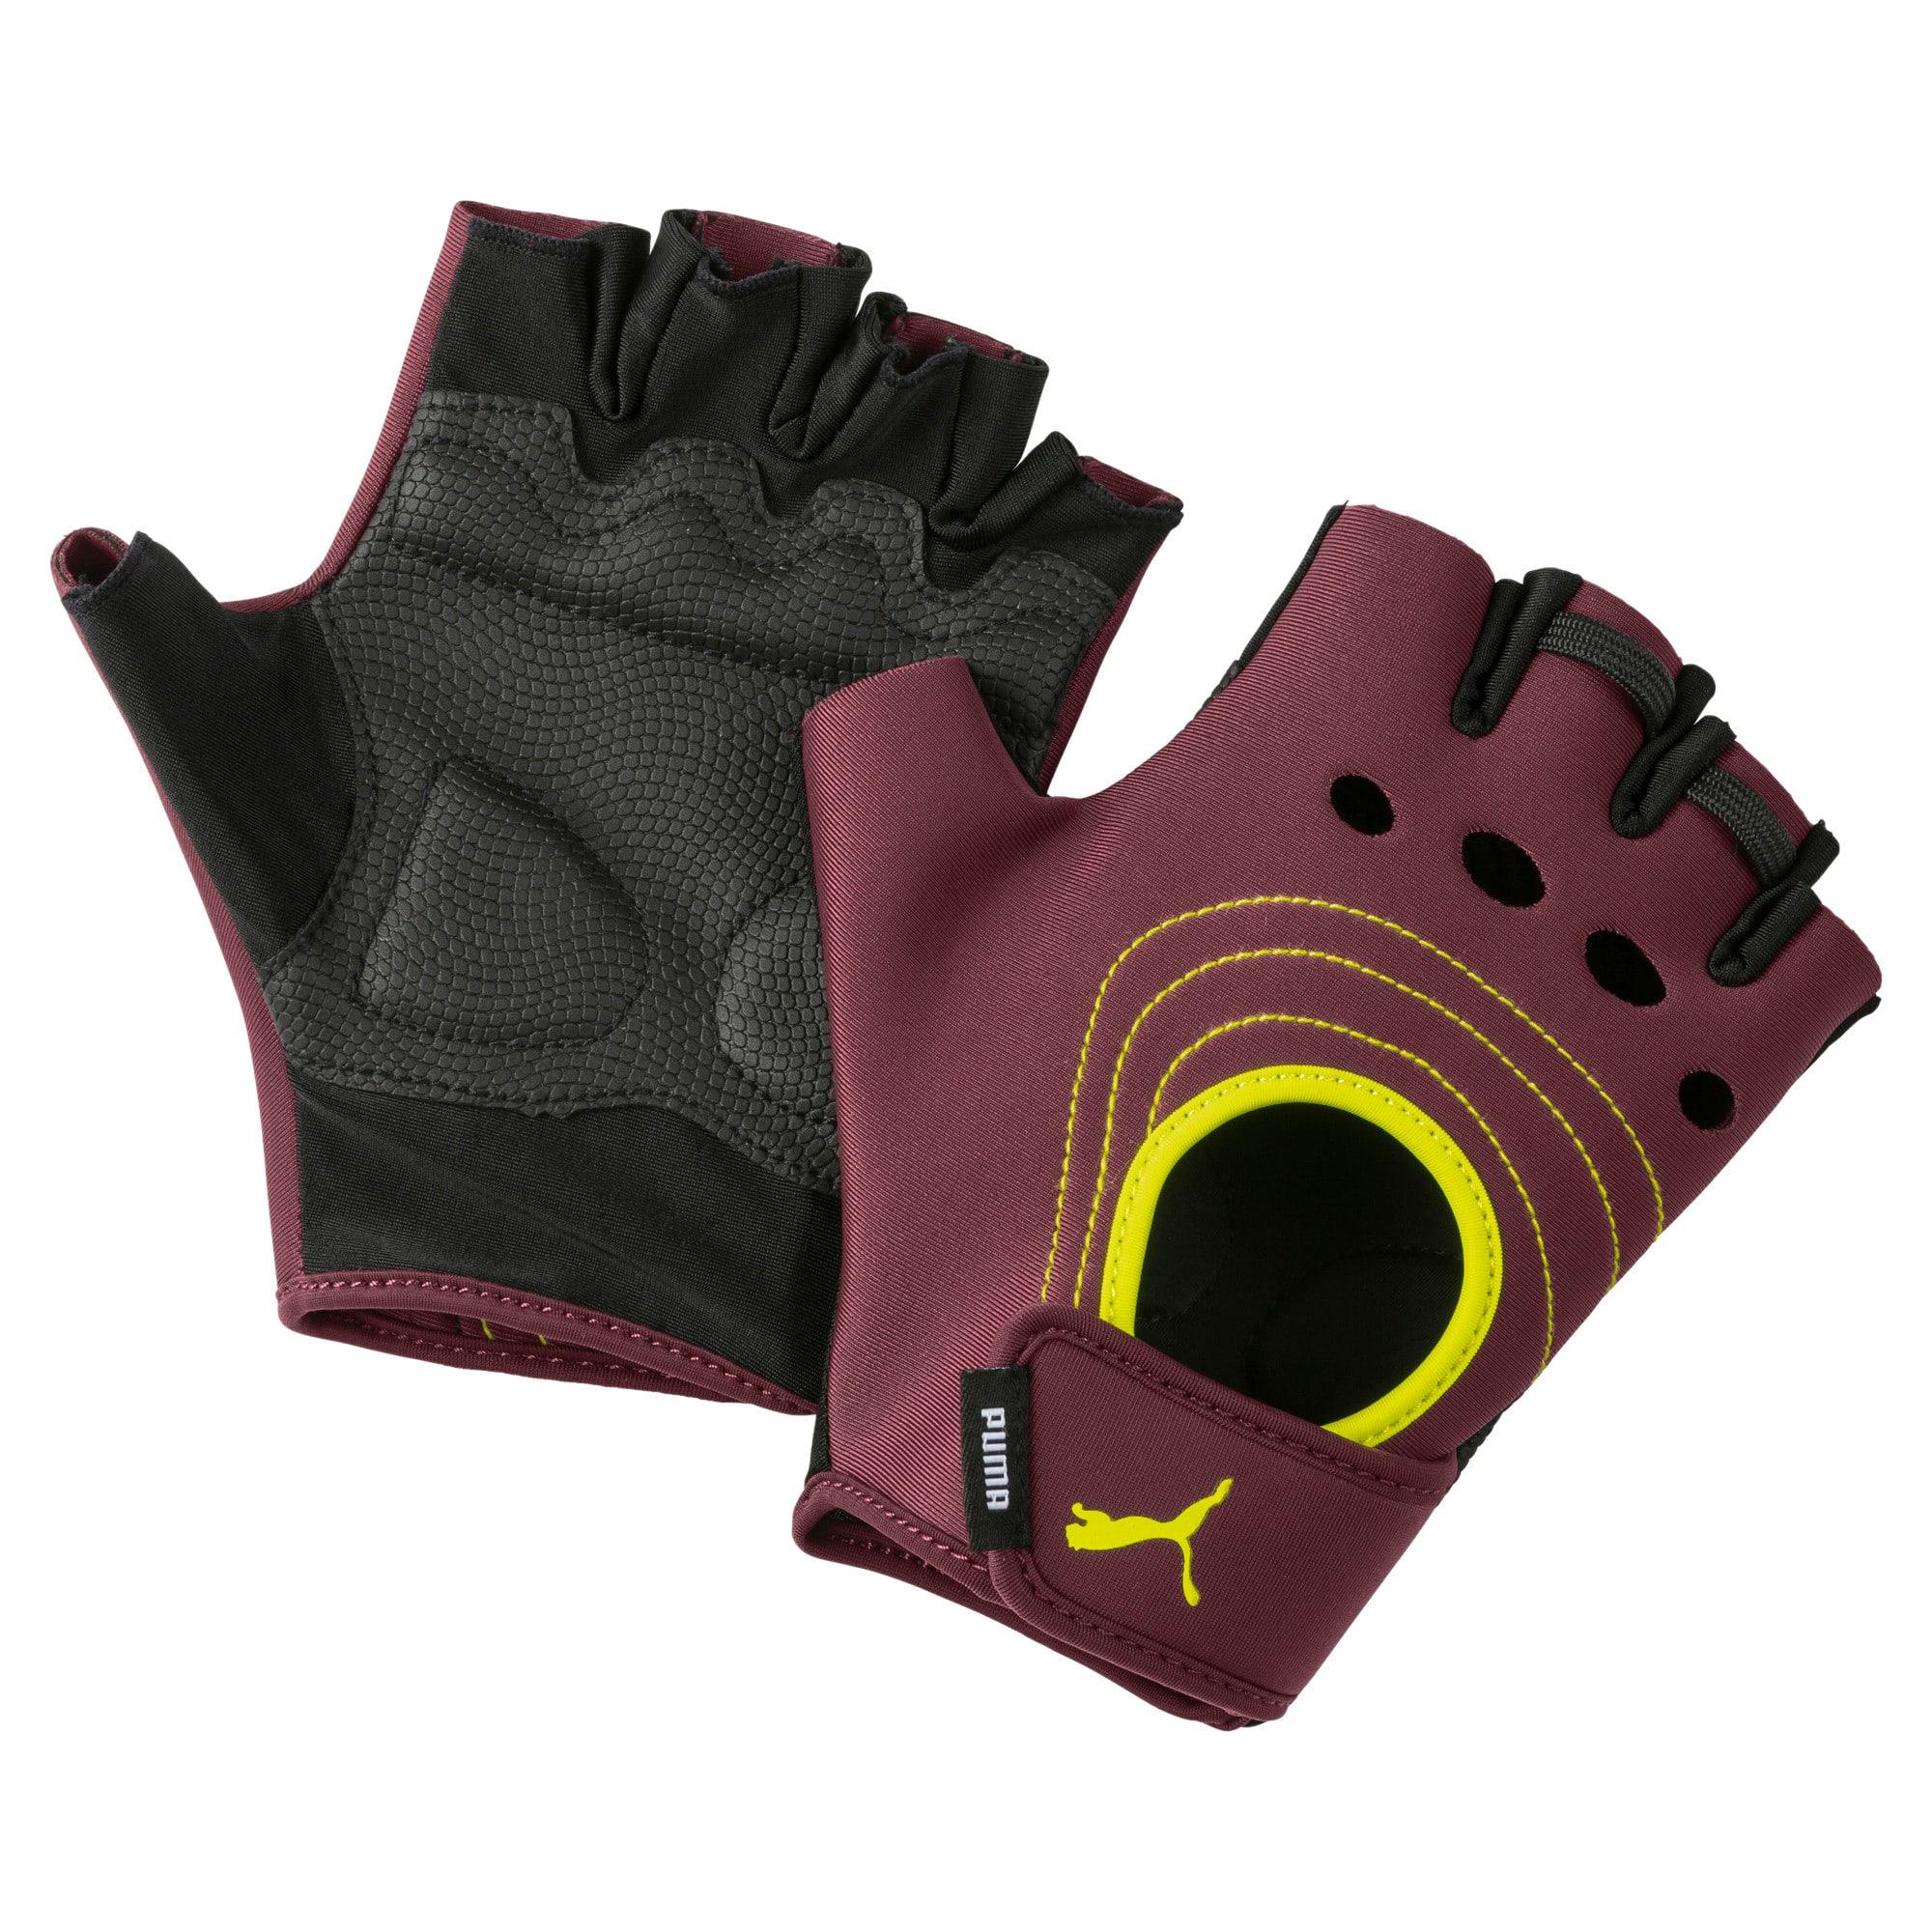 Thumbnail 1 of AT Women's Training Fingered Gloves, Vineyard Wine-Yellow Alert, medium-IND